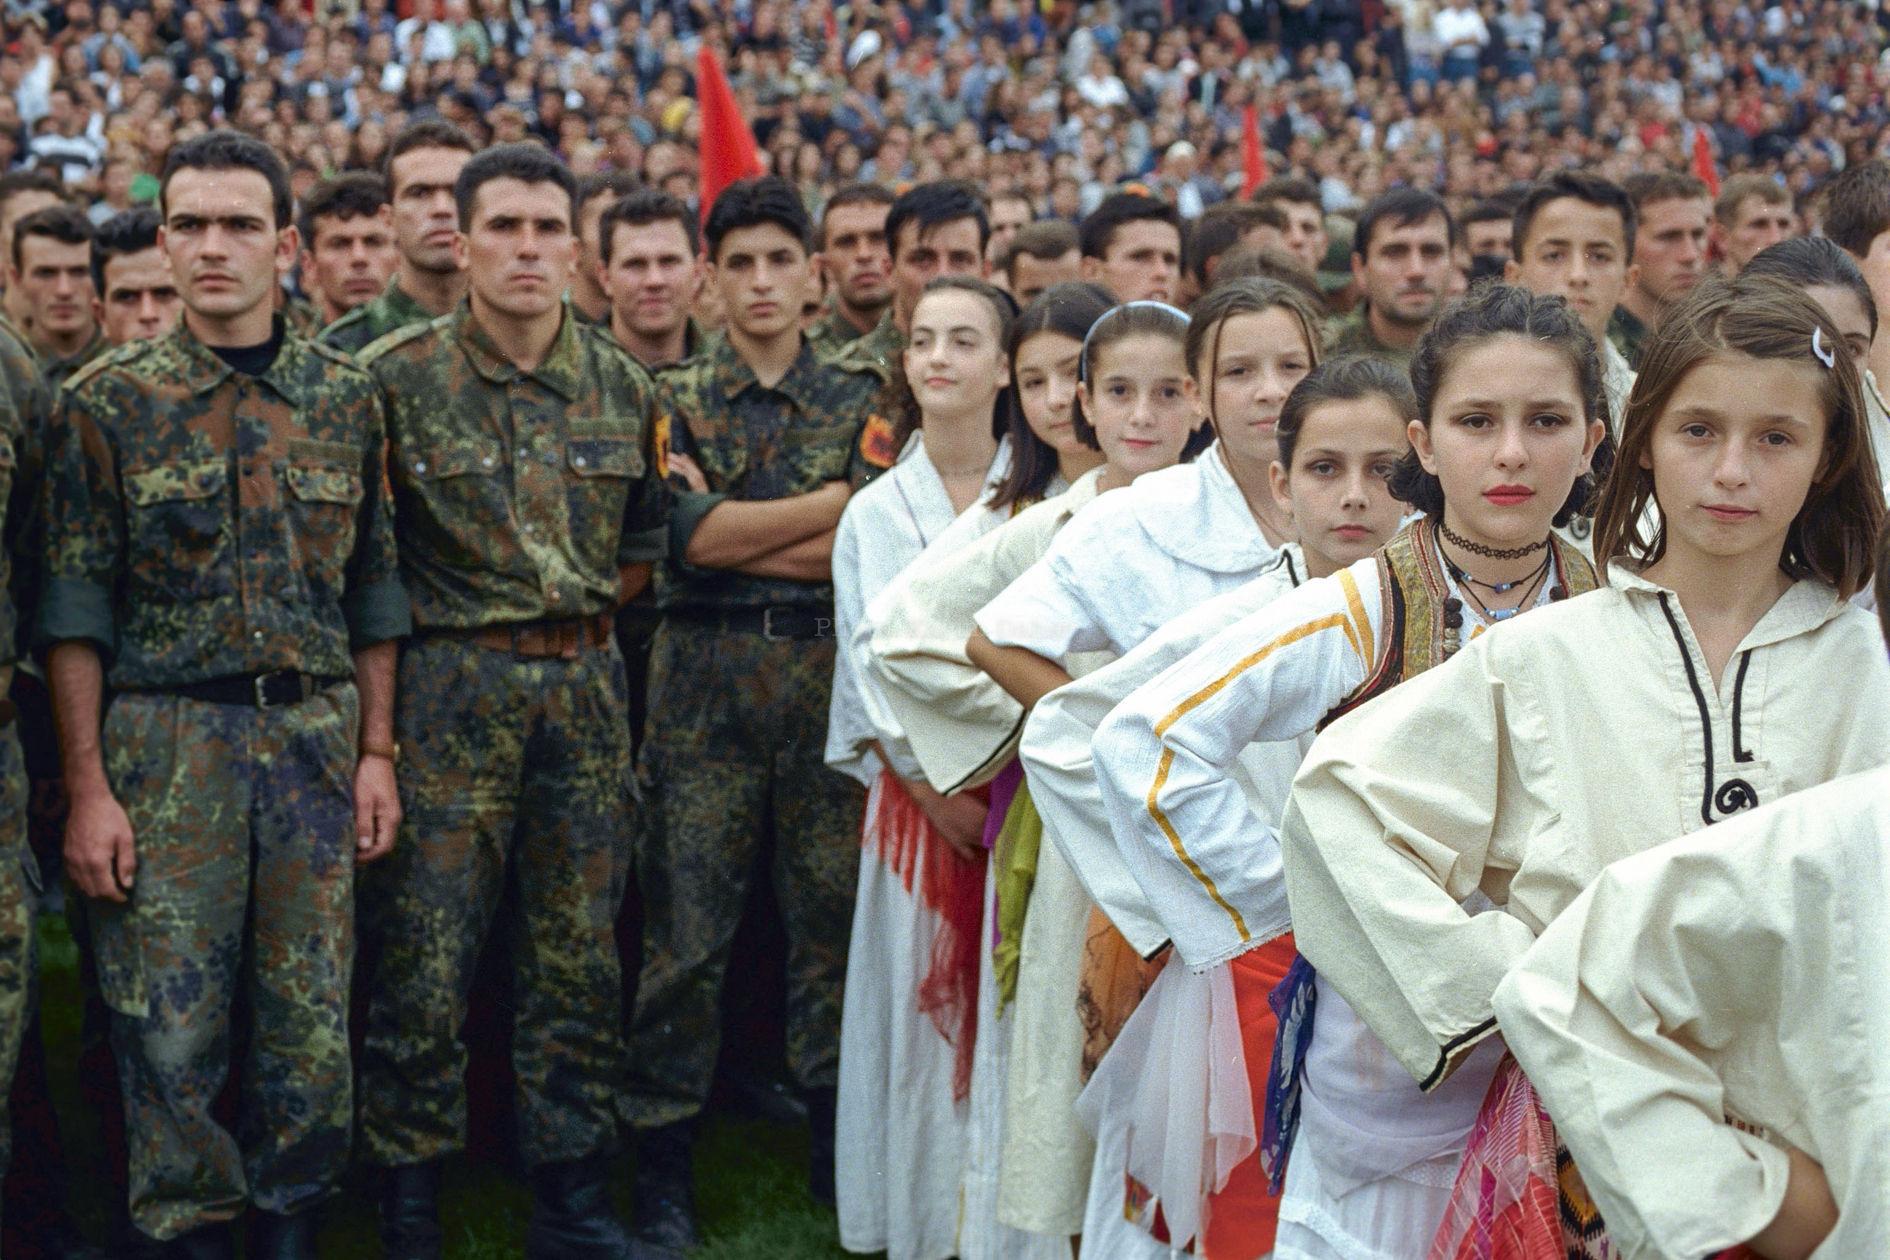 Kosovo, Pristina, été 1999. Commémoration organisée par l'UCK.